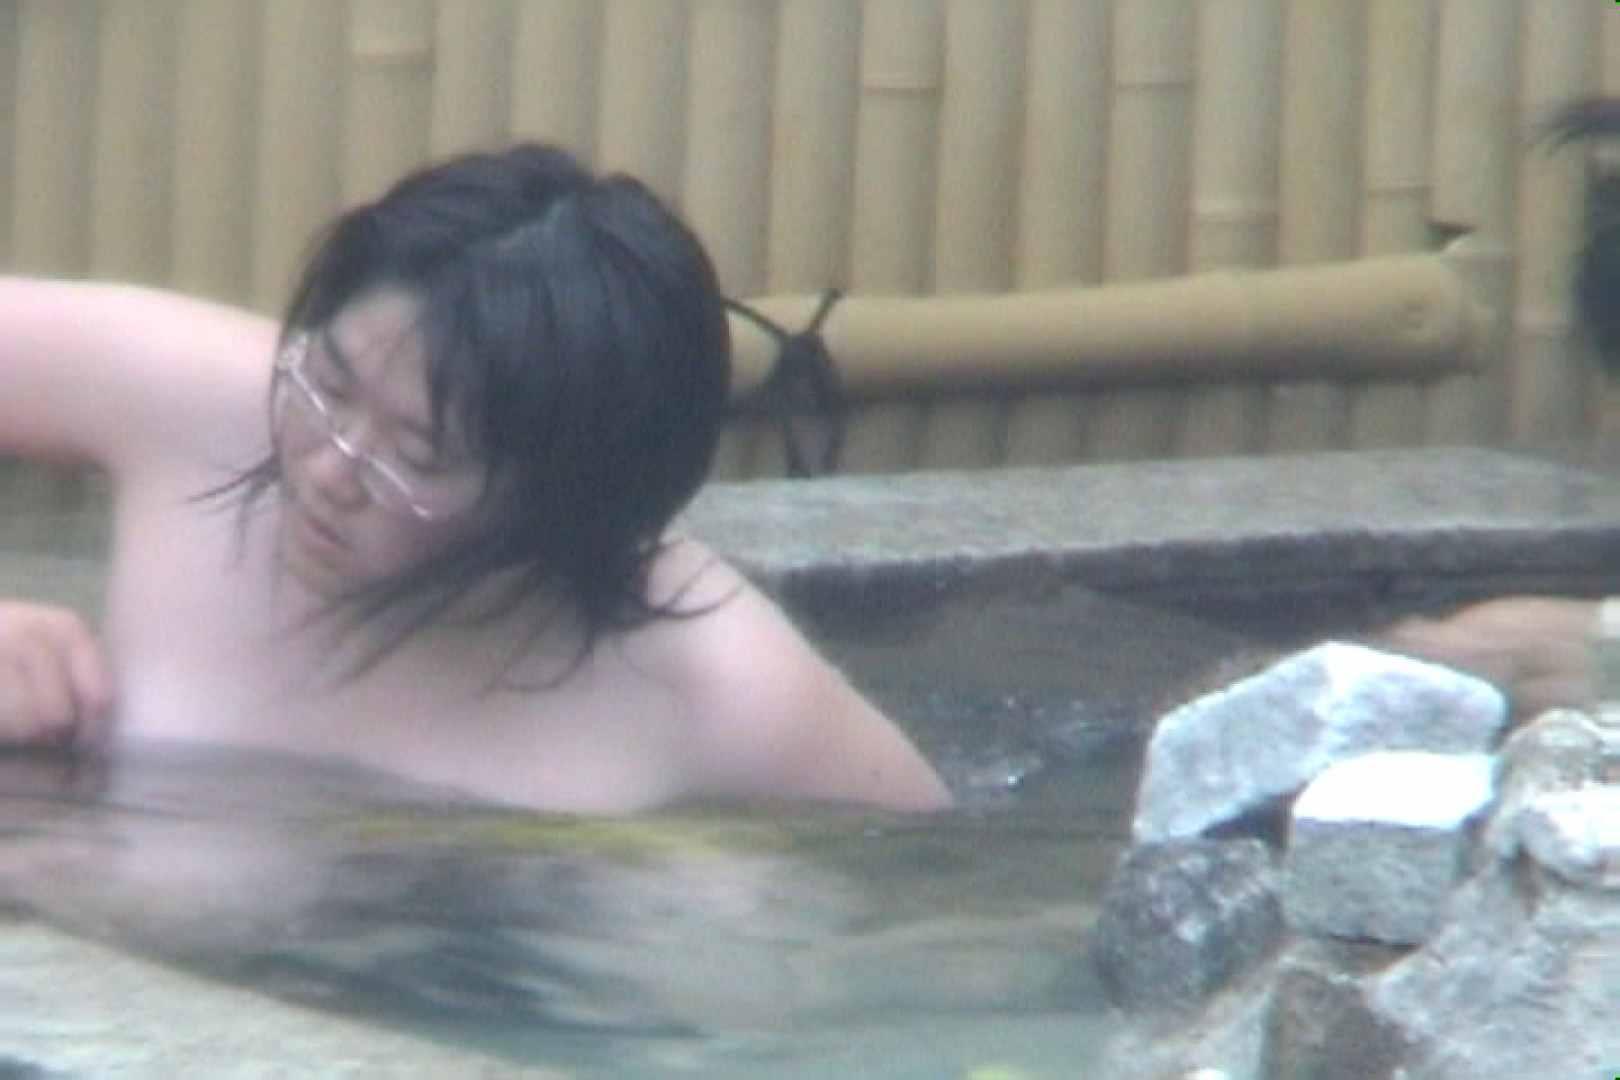 Aquaな露天風呂Vol.46【VIP限定】 HなOL | 露天  90pic 6